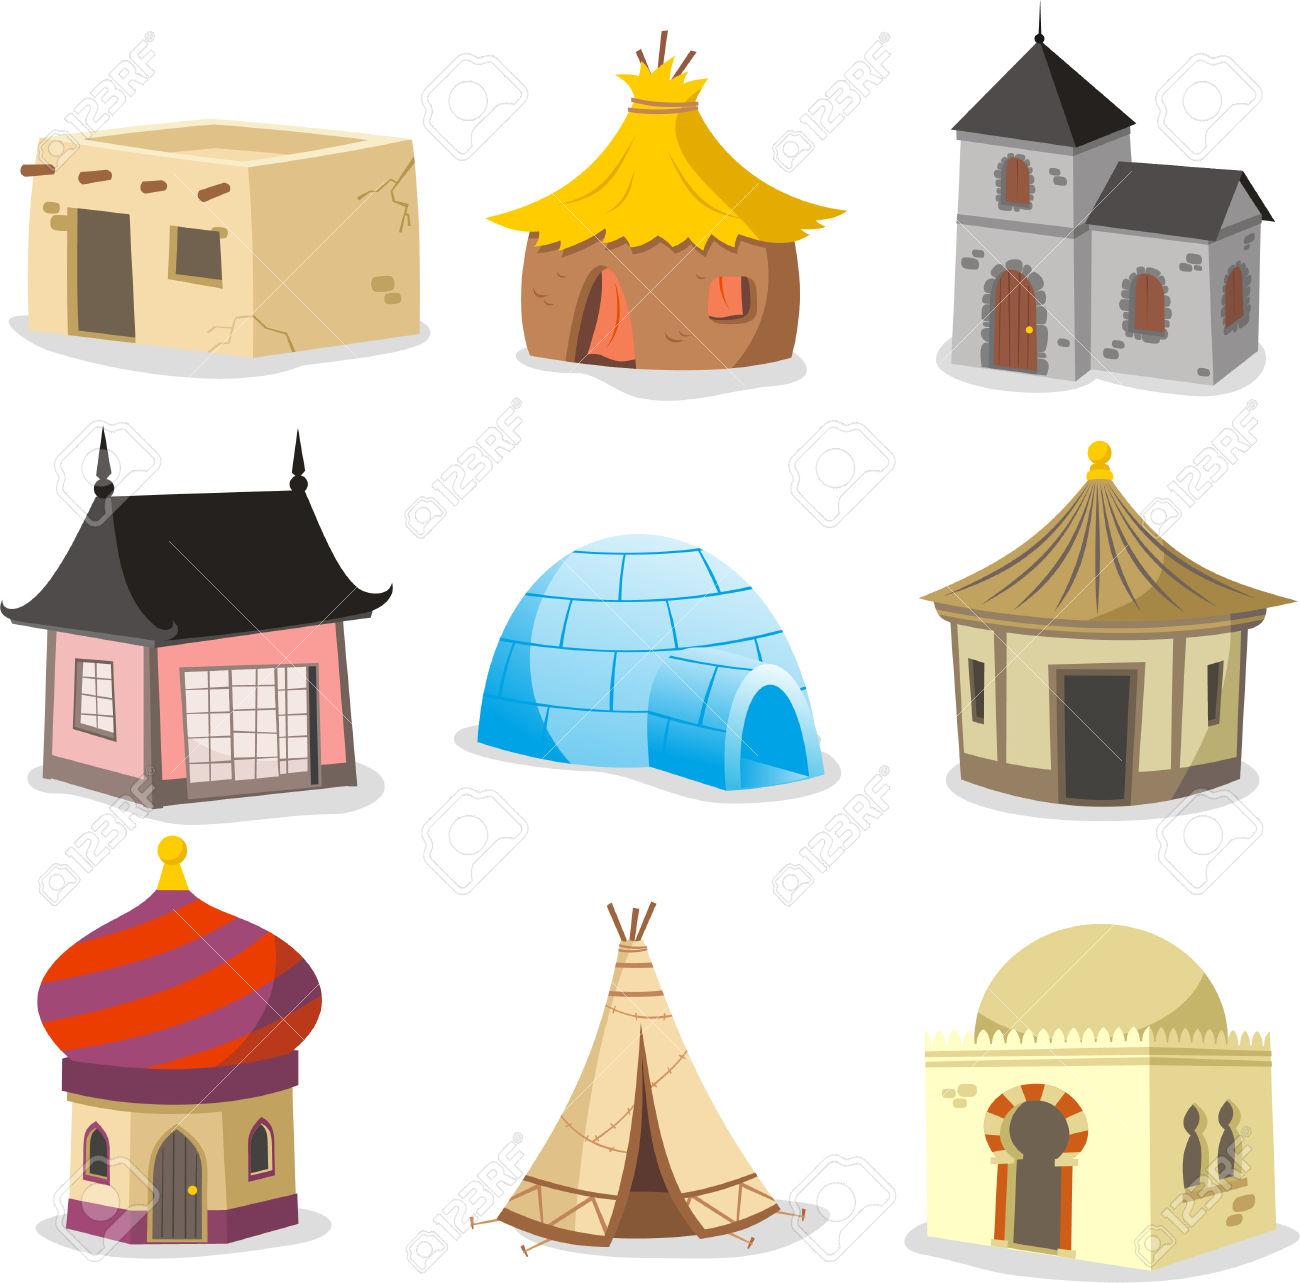 Set Of Traditional Houses. With House, Igloo, Hut, Shack, Slum.